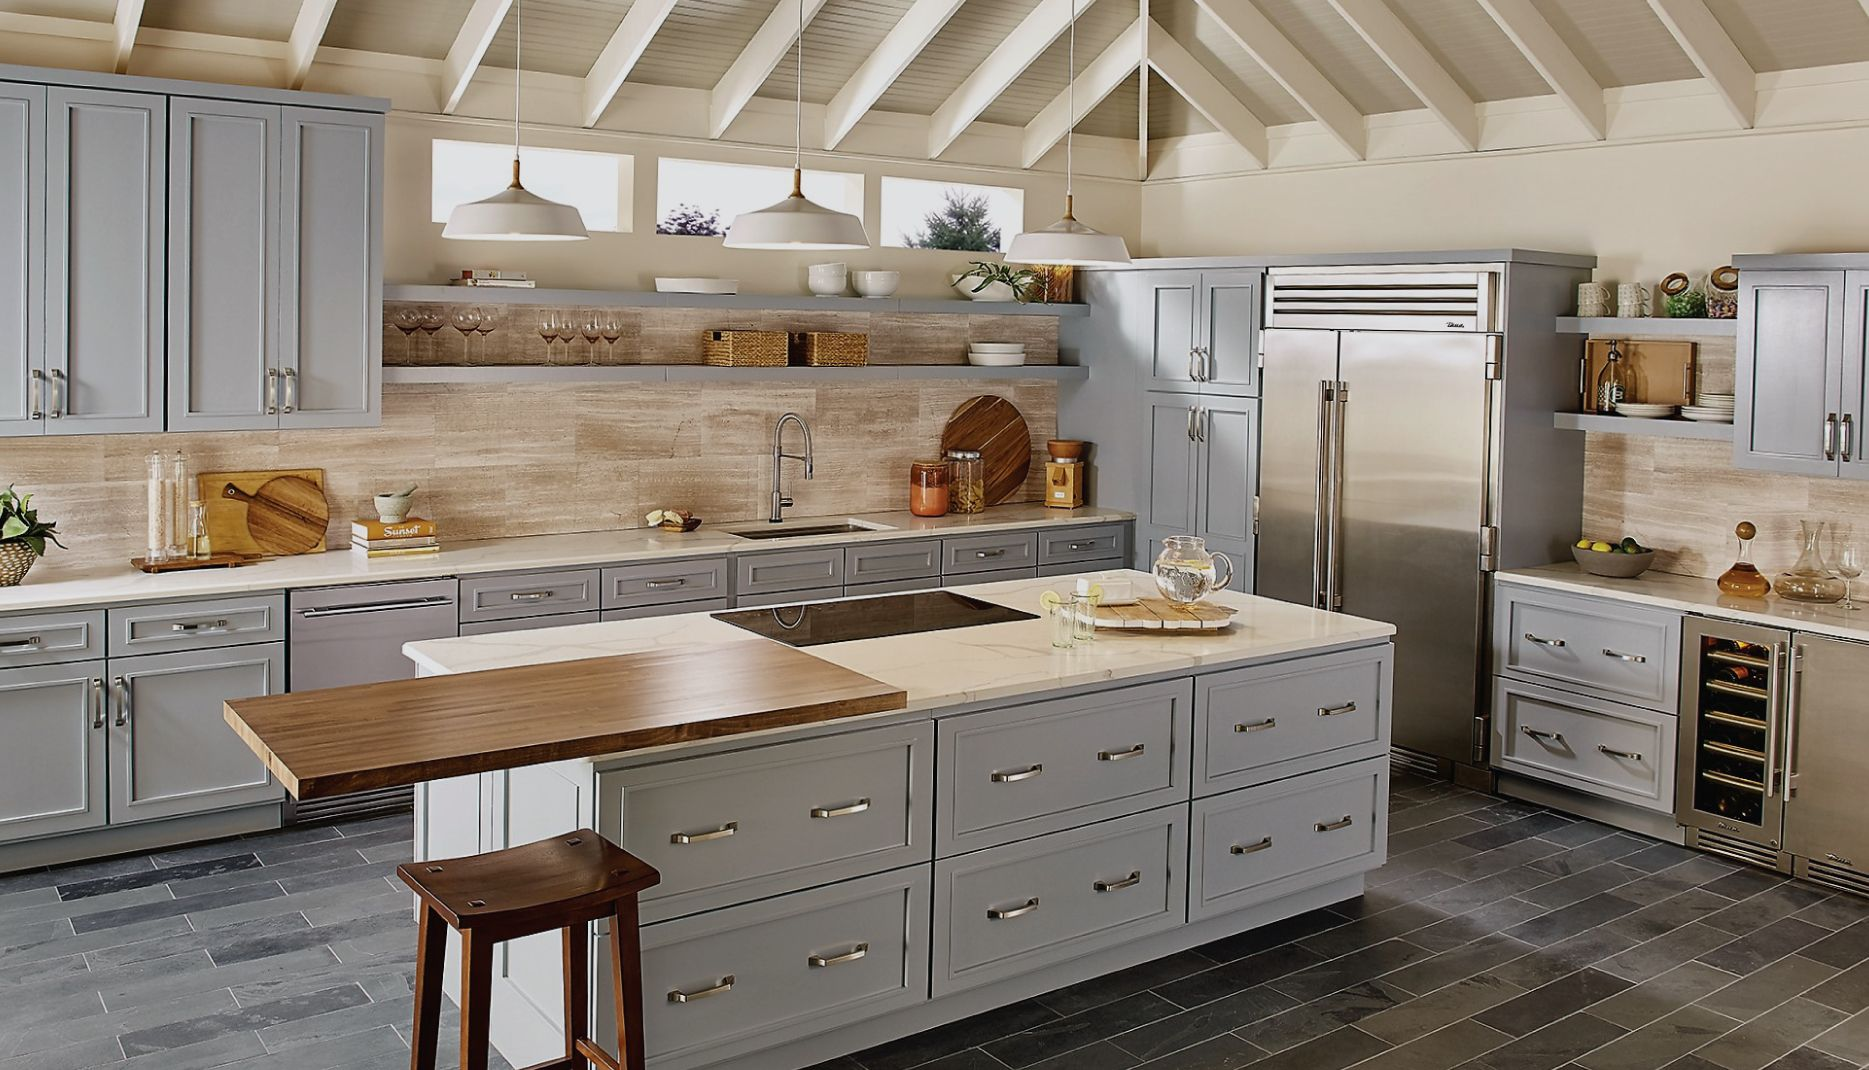 Silex Interiors | Kitchen cabinet colors, Bertch cabinets ...